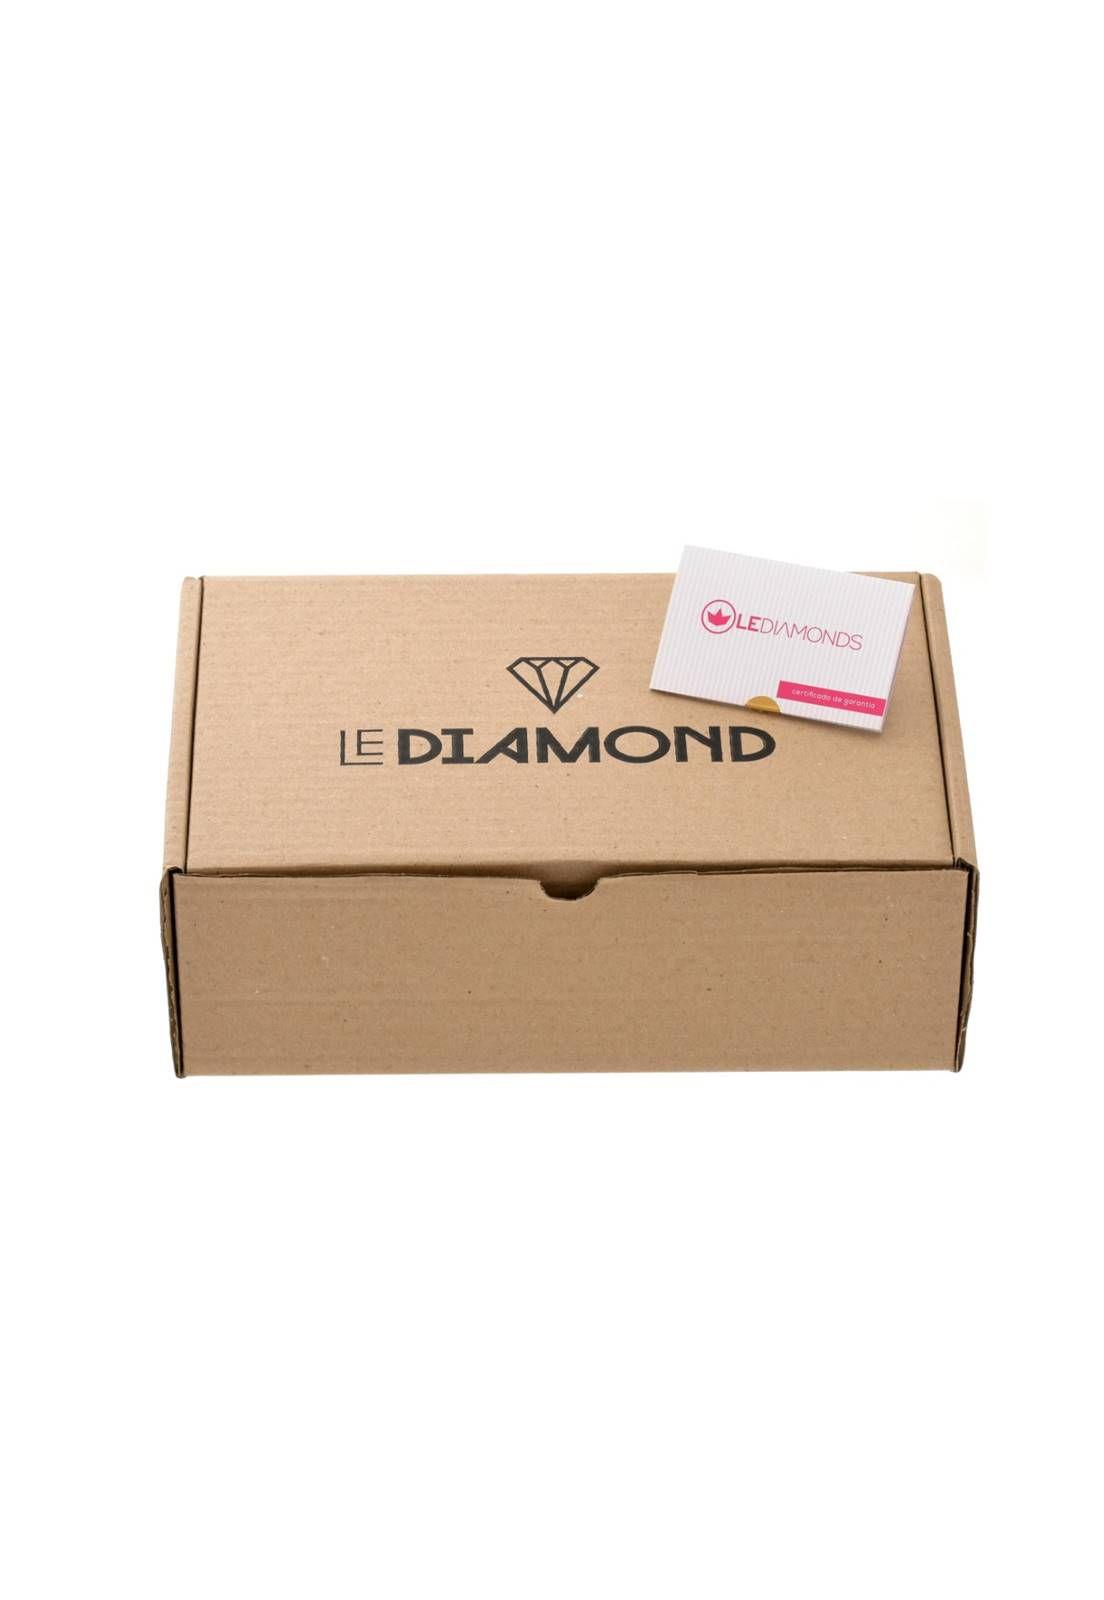 Brinco Le Diamond Acrílico Marrom